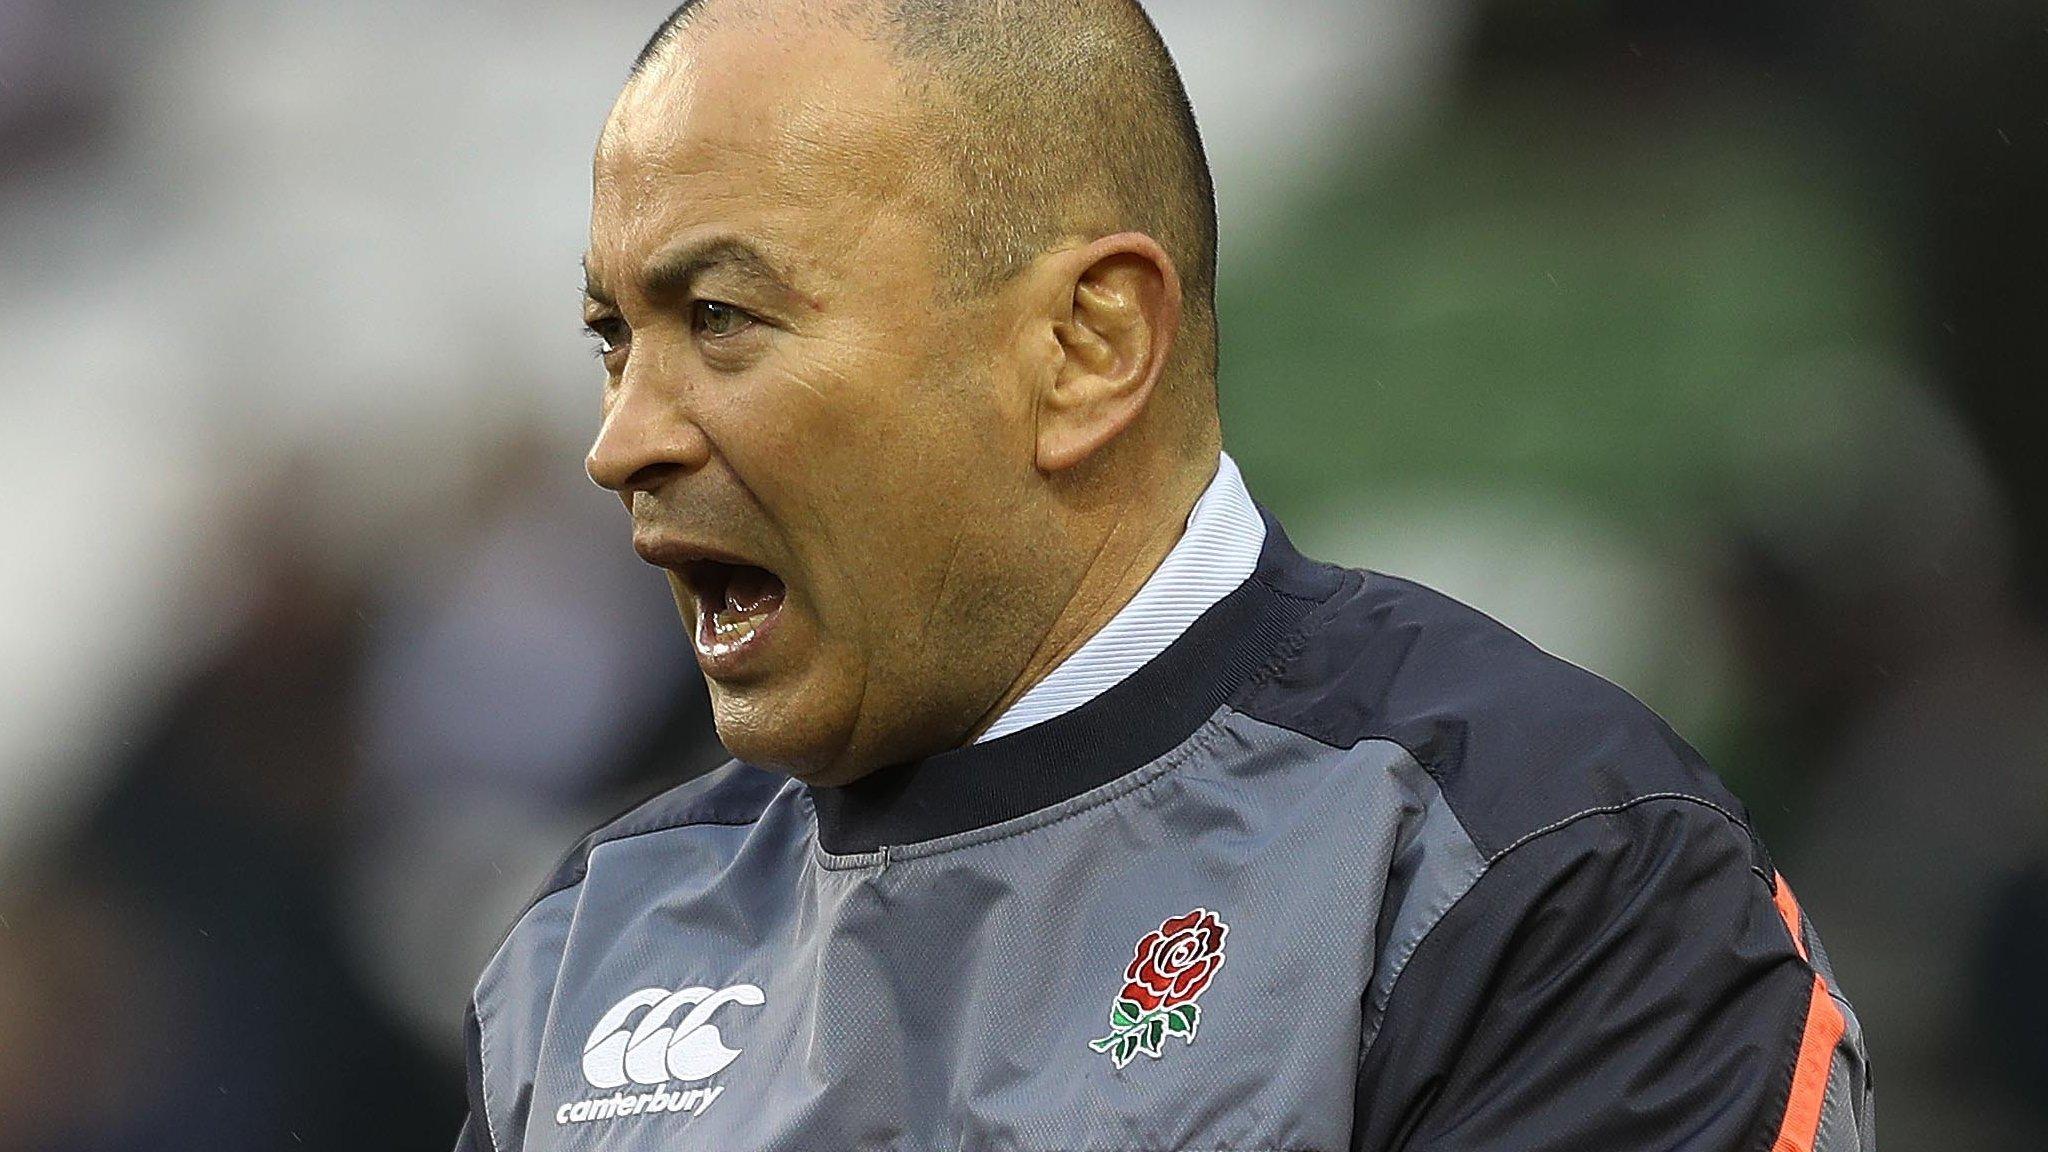 British & Irish Lions: England's Eddie Jones suggests four-man plan for Lions captaincy